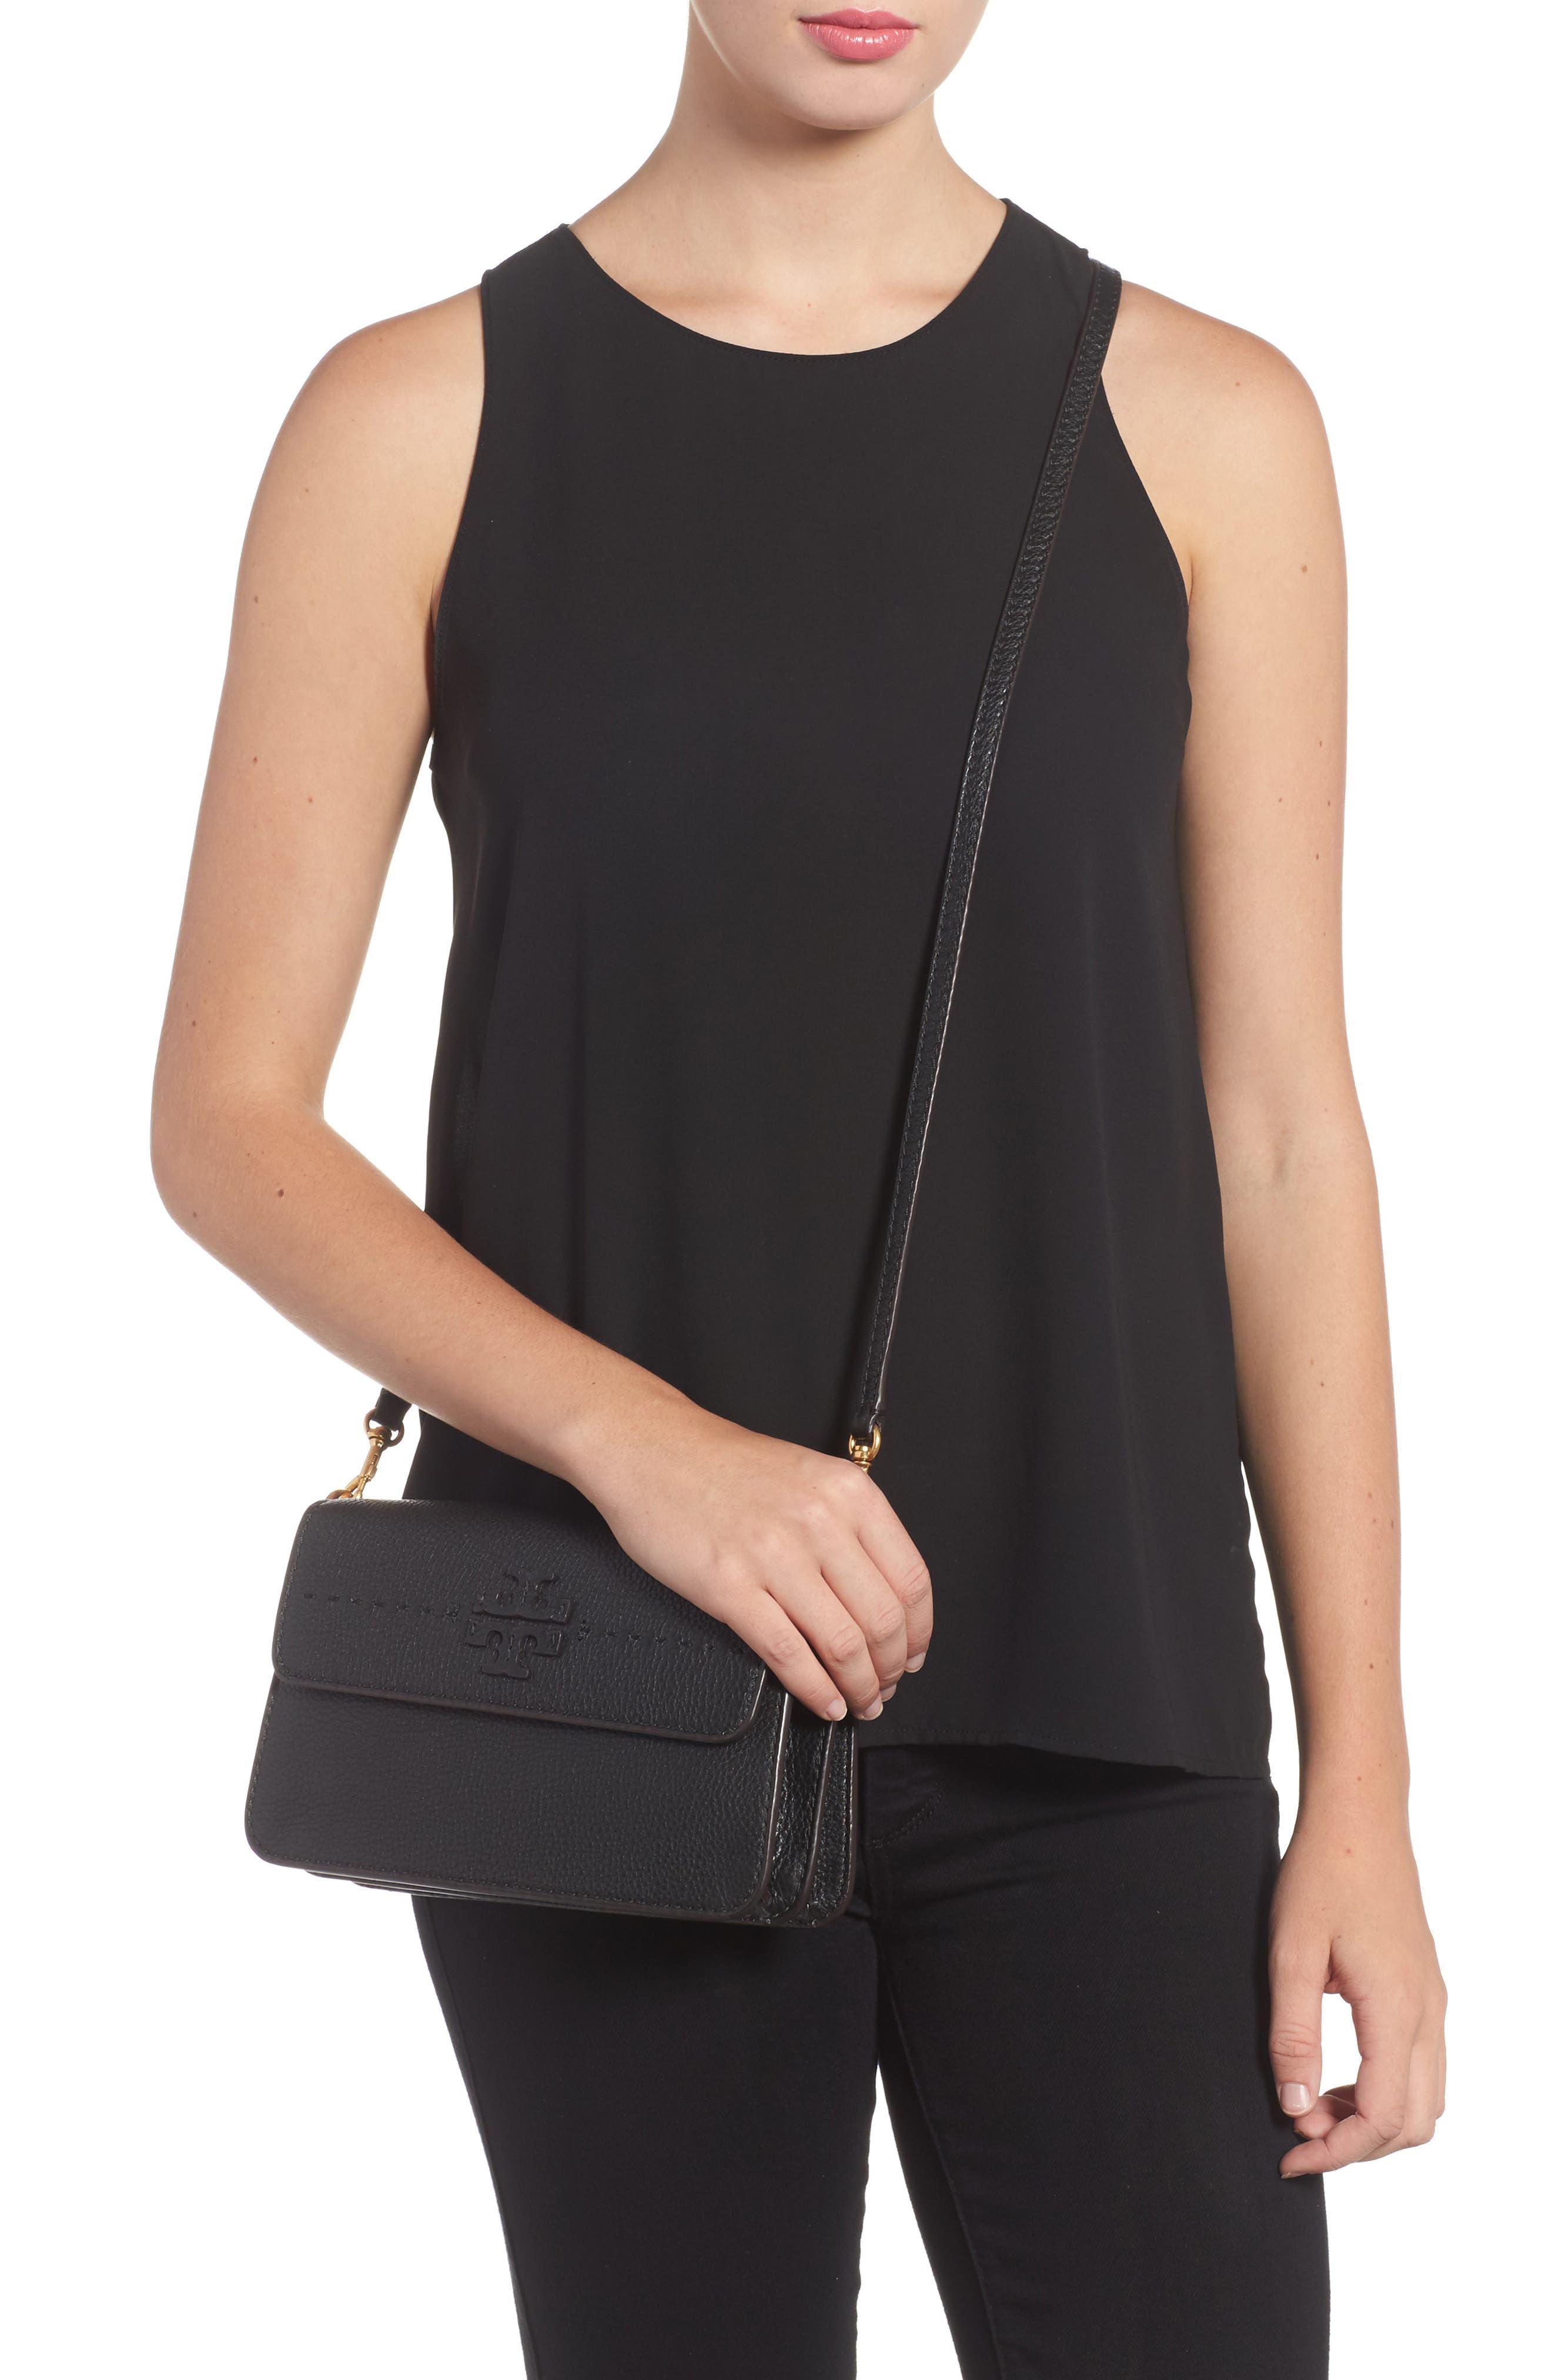 McGraw Leather Shoulder Bag,                             Alternate thumbnail 2, color,                             001